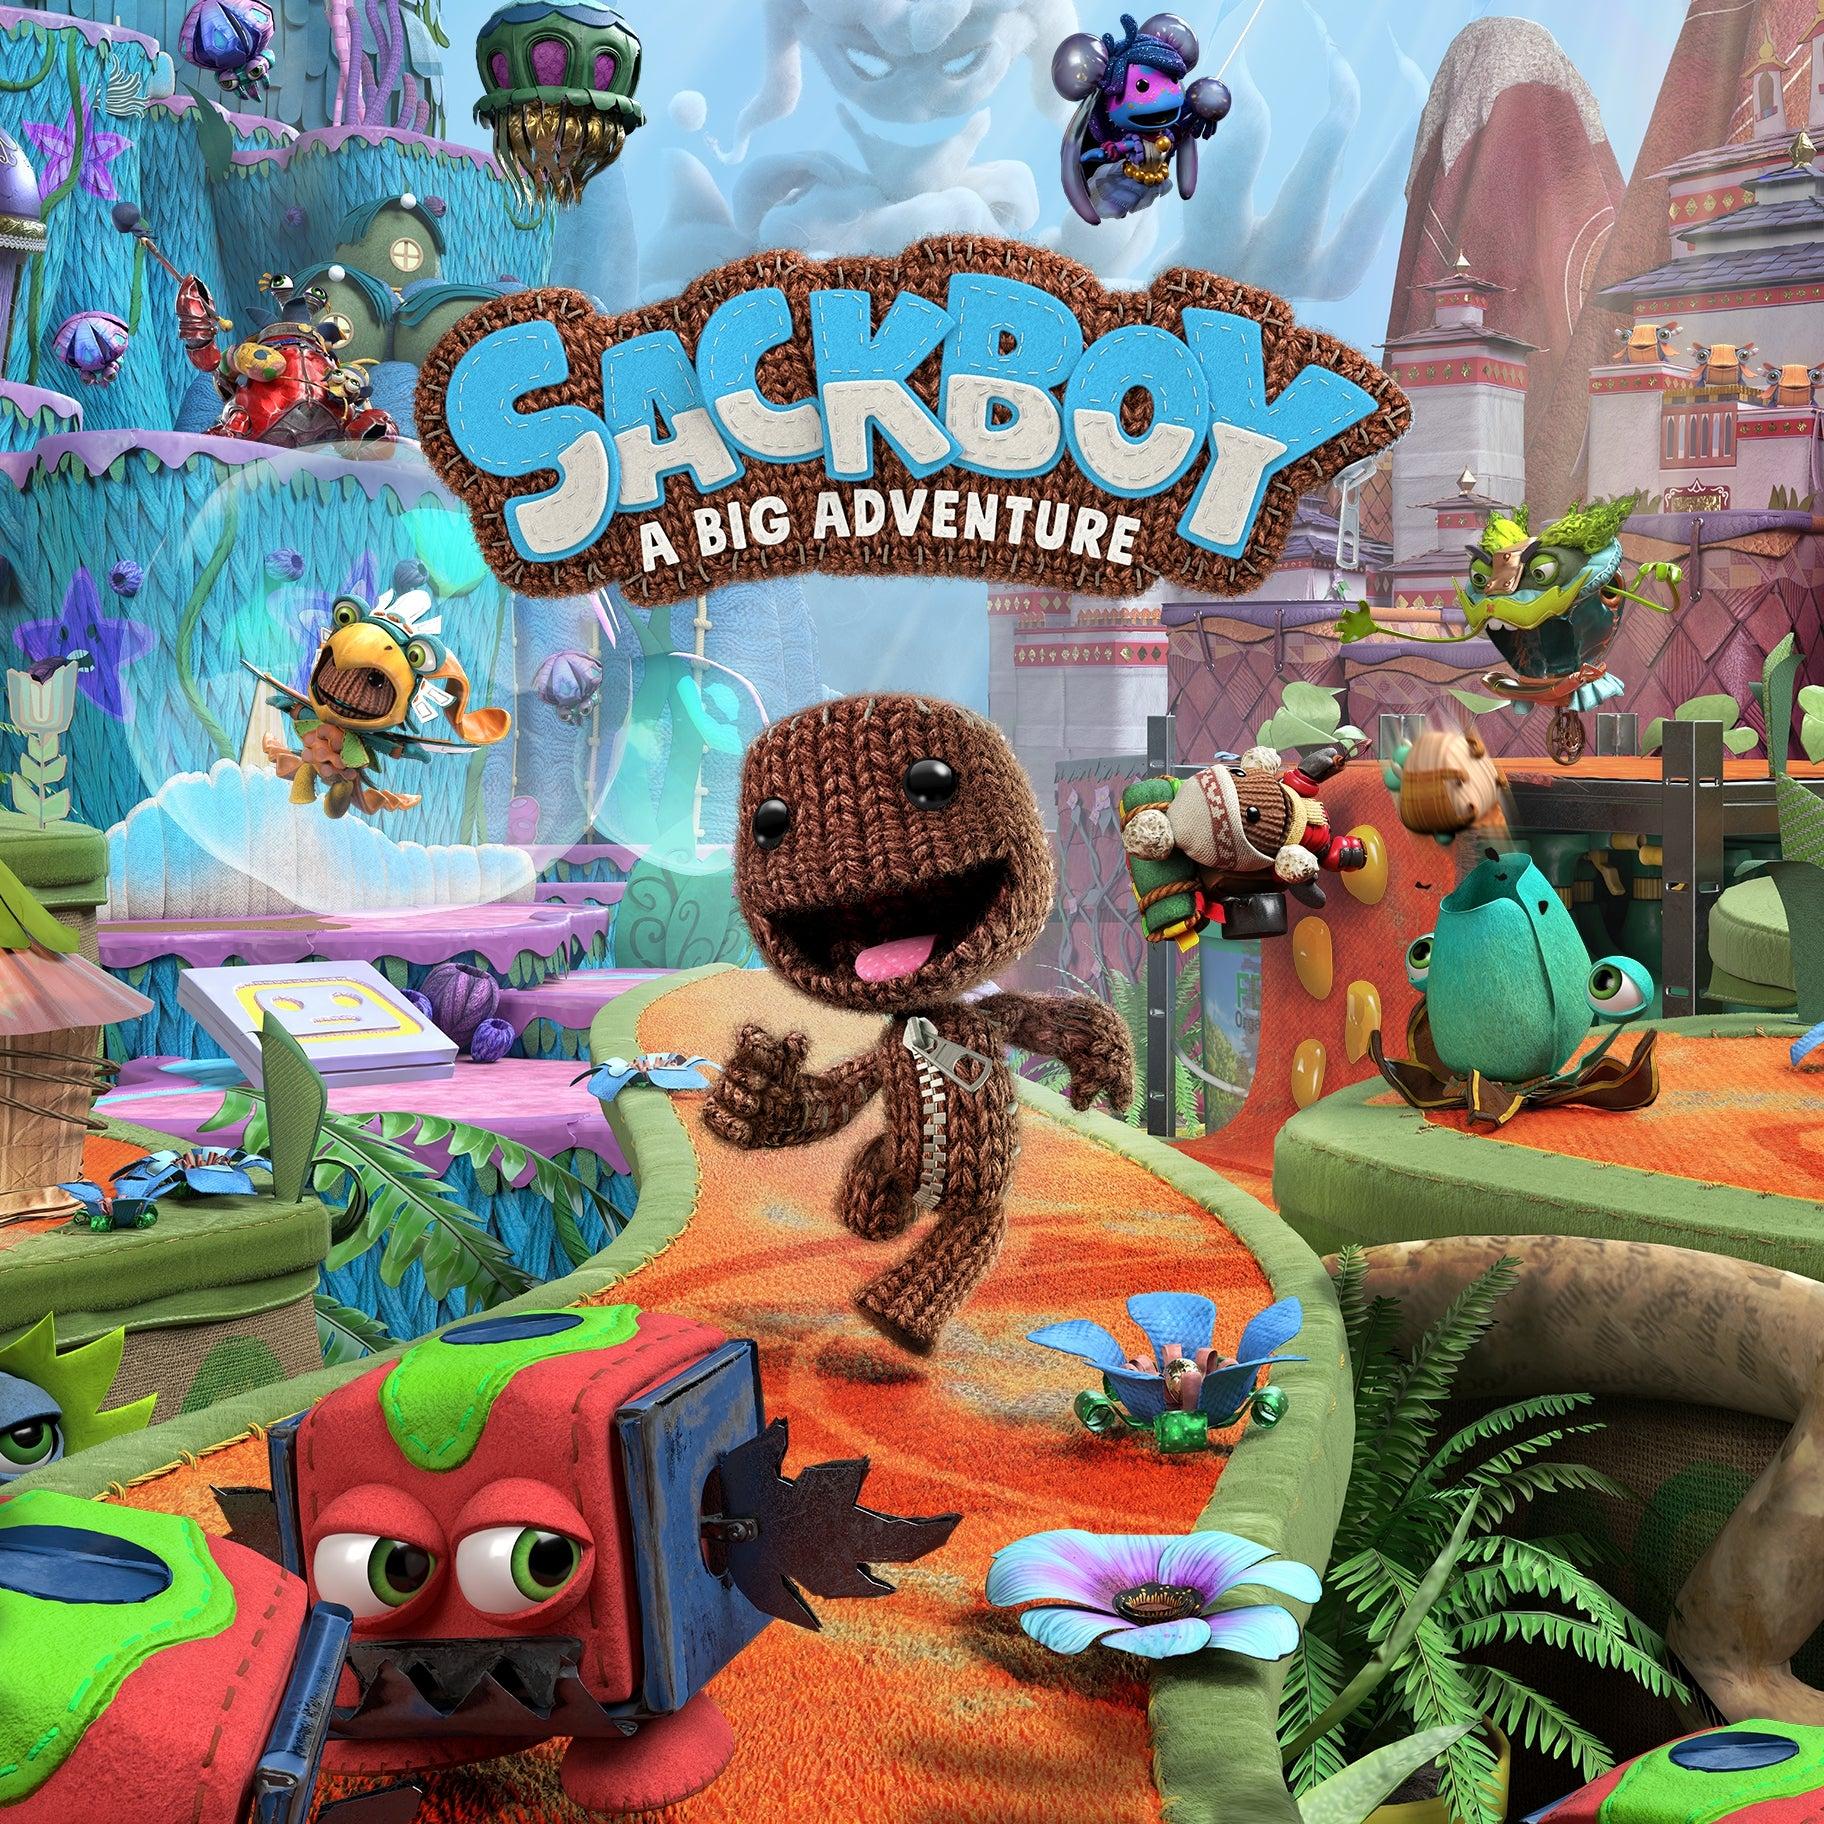 Sackboy: A Big Adventure - Strickritter der Kokosnuss im 0815 Jump & Run-Baukasten